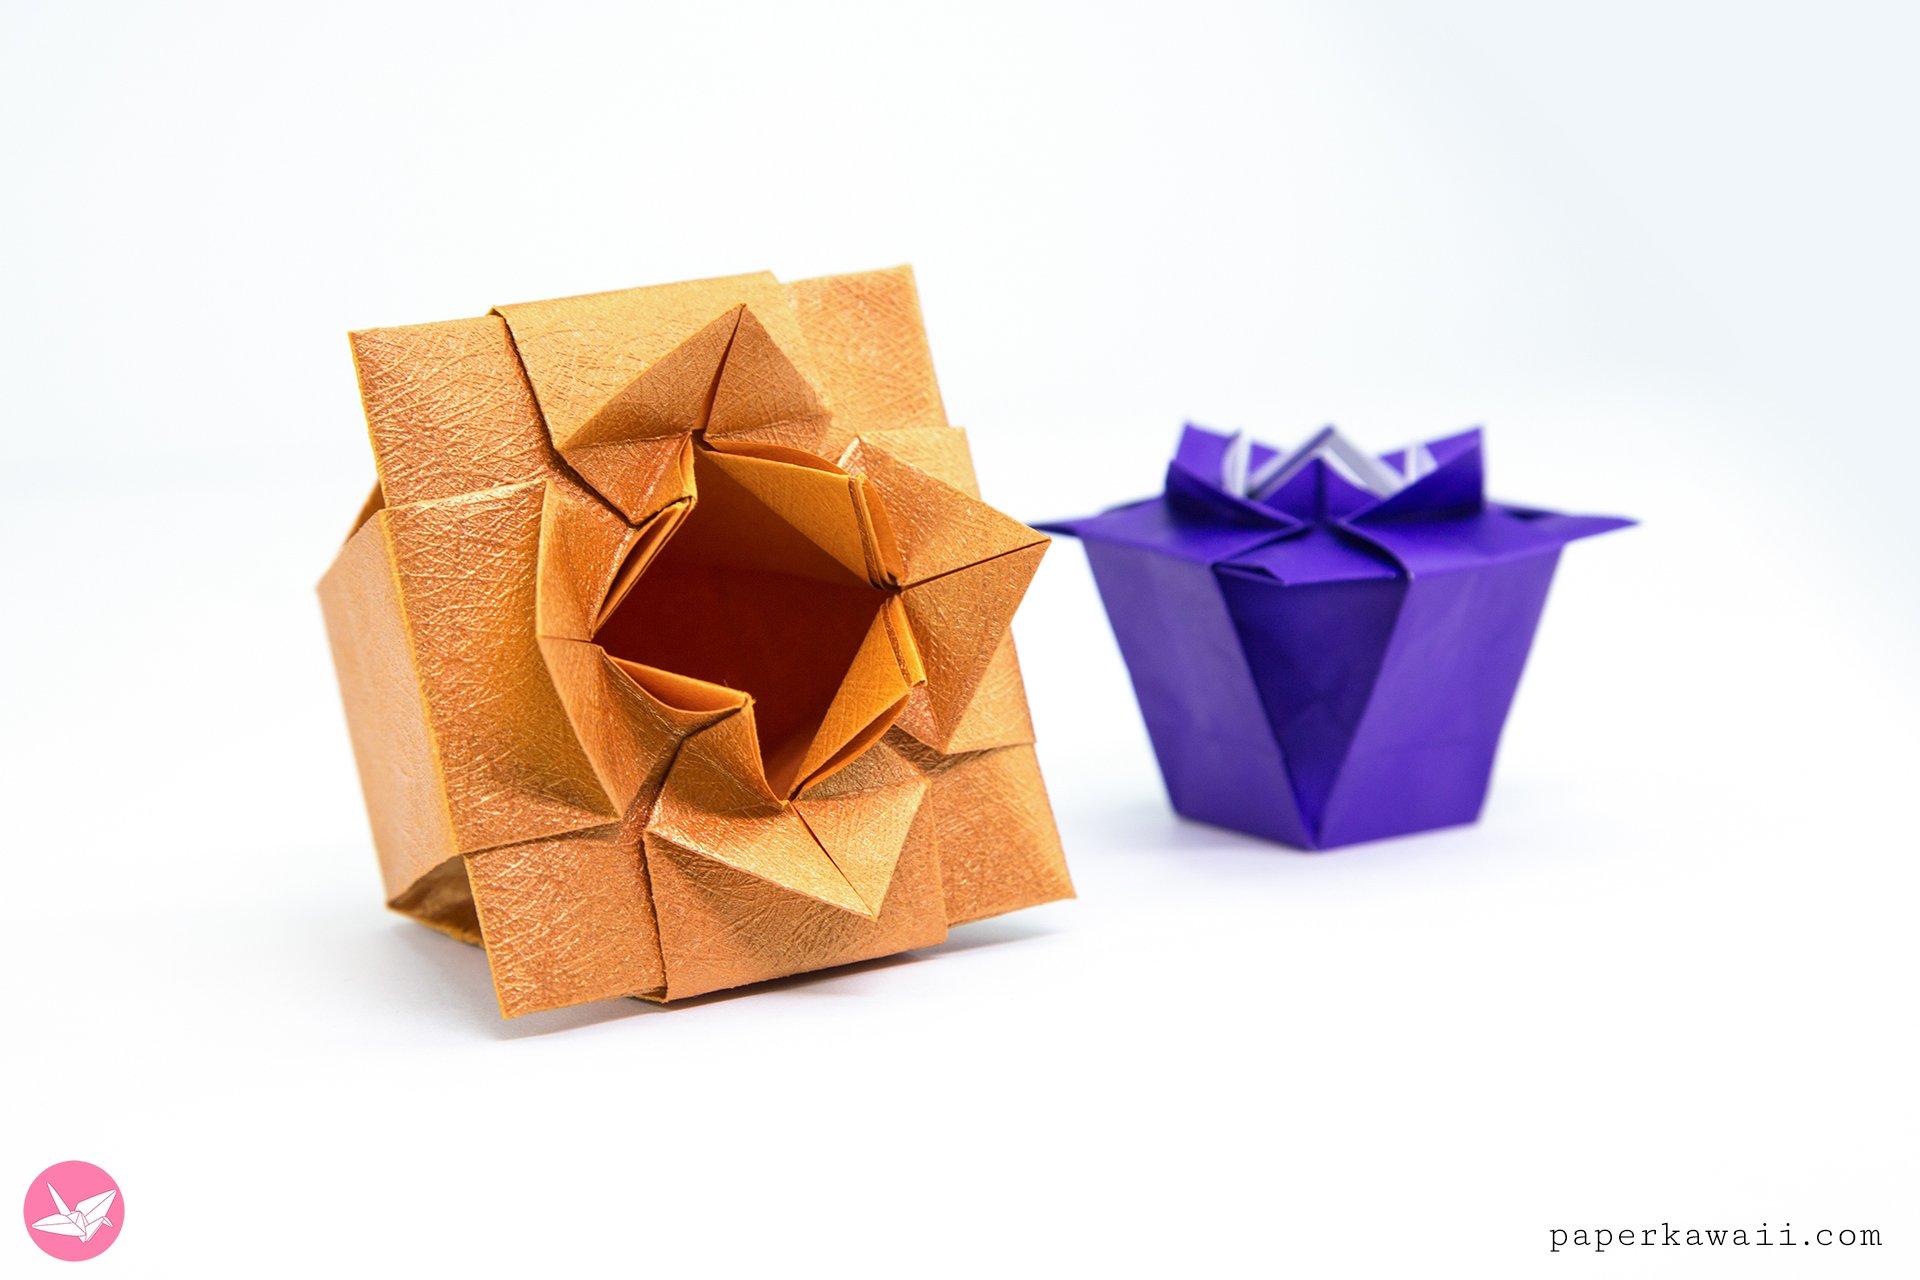 https://nanopdf.com/download/origami-crane-folding-instructions_pdf | 1280x1920